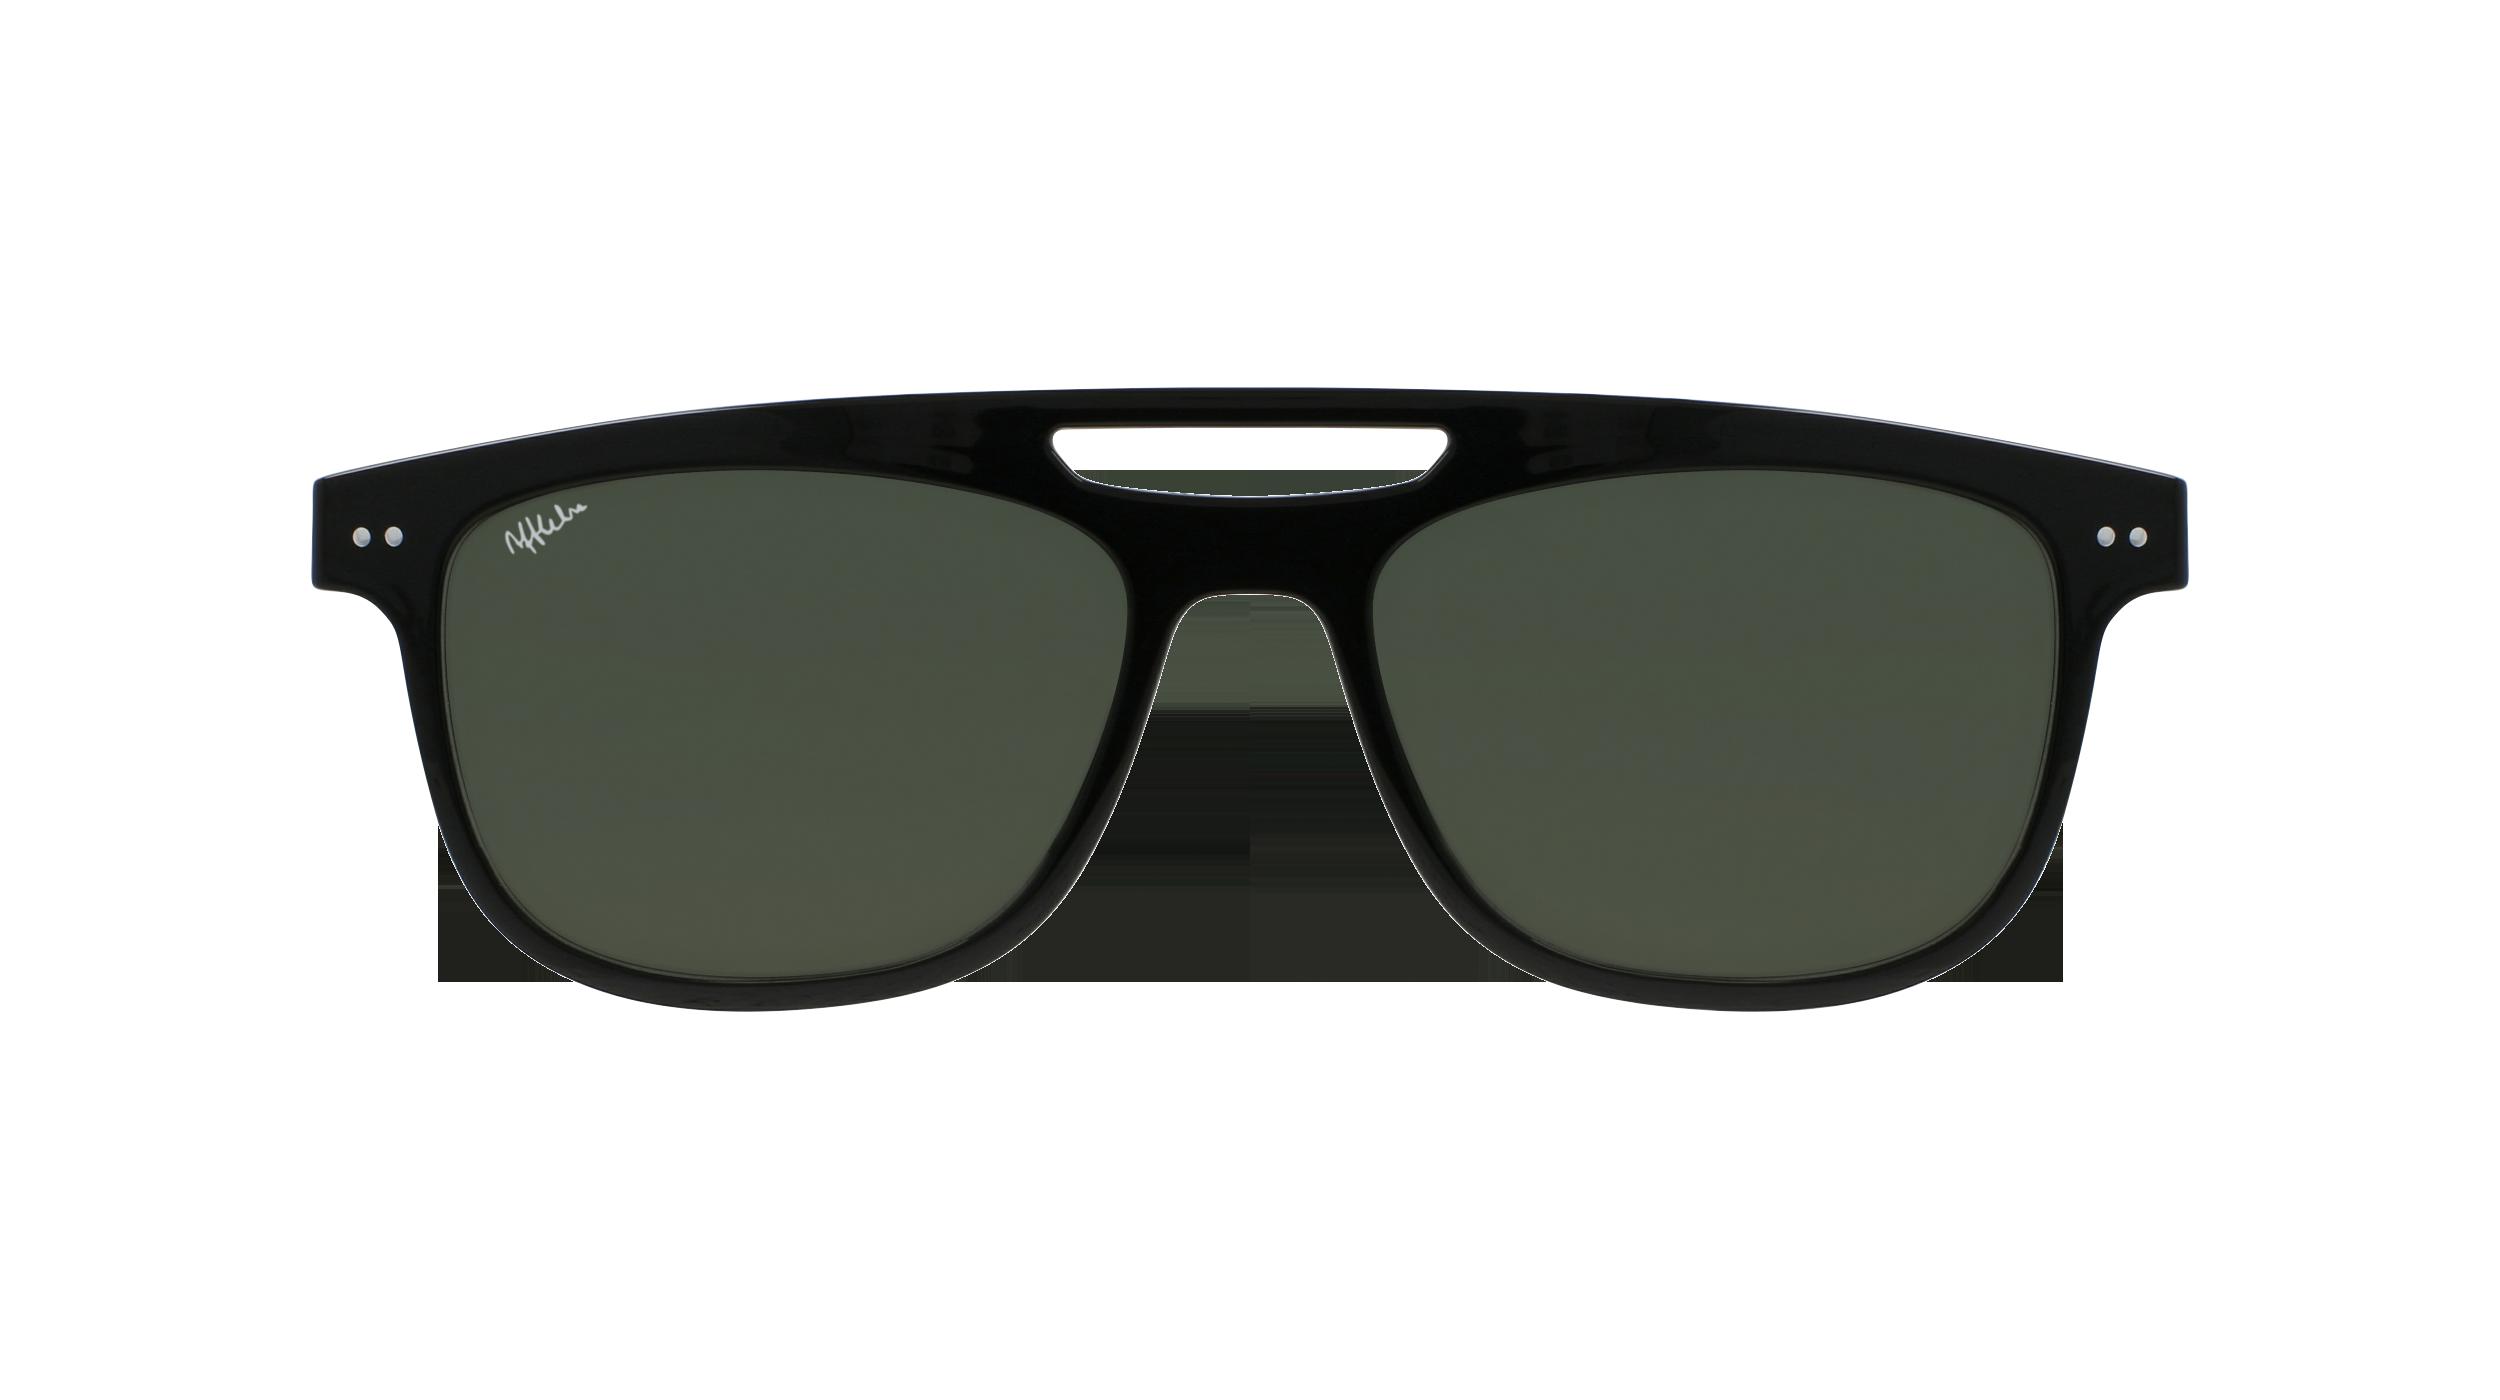 afflelou/france/products/smart_clip/clips_glasses/07630036436134.png